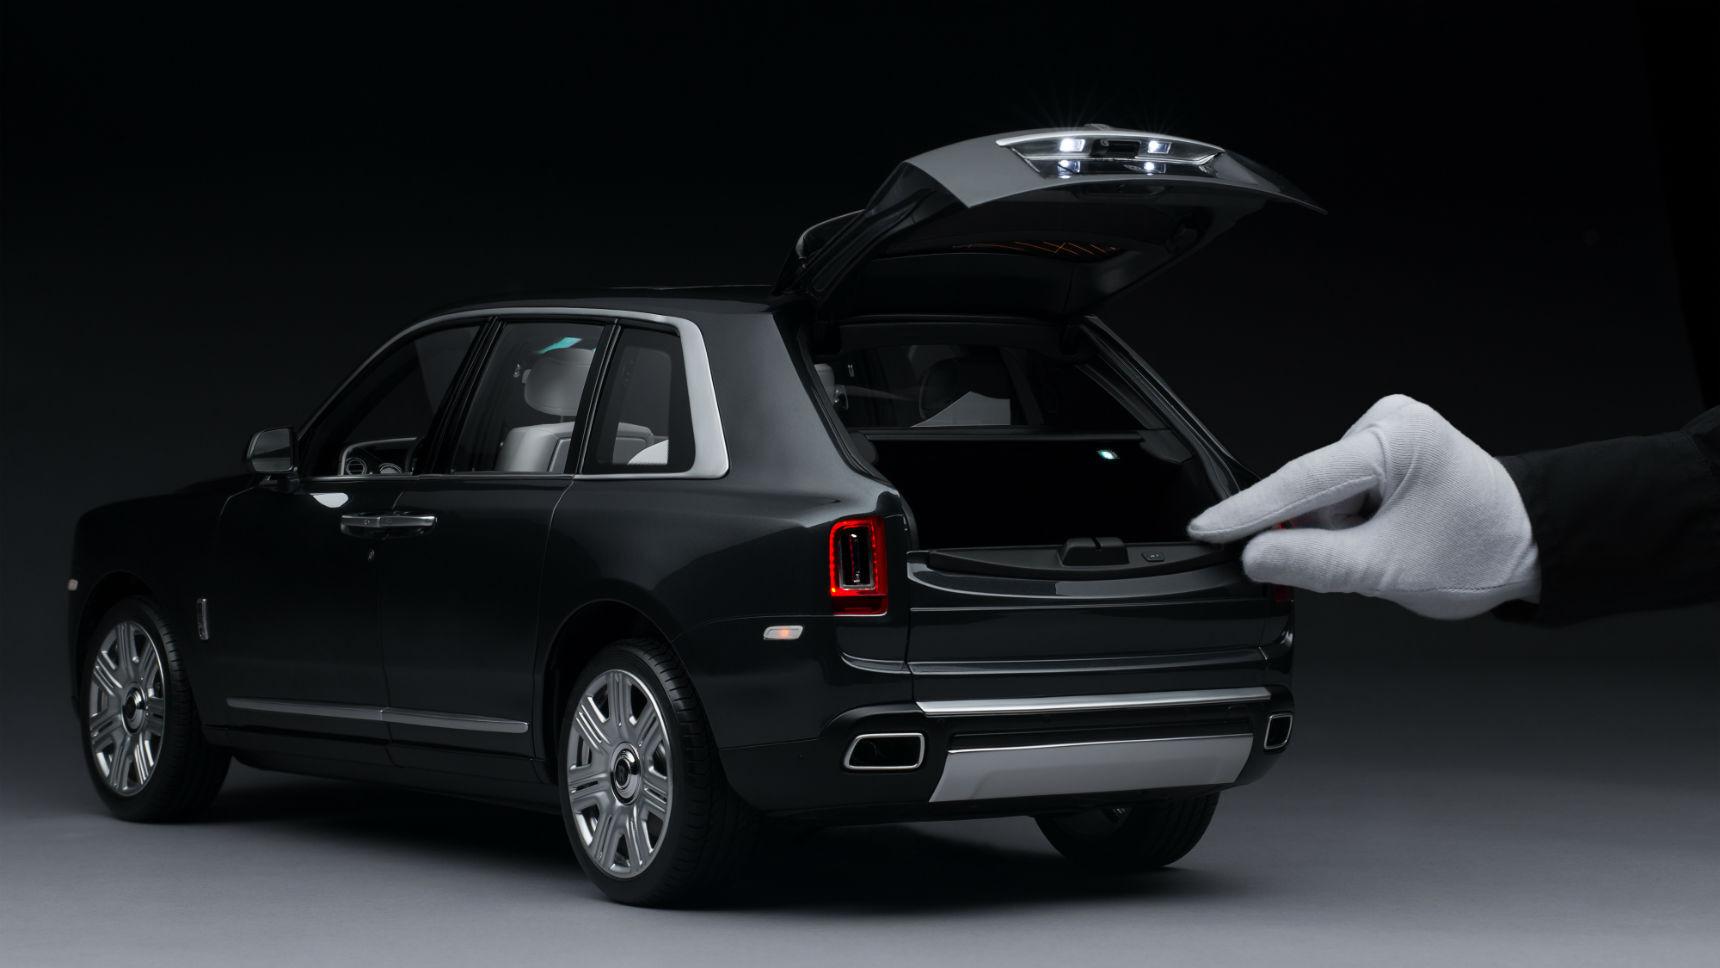 Цифра дня: На сборку масштабного Cullinan Rolls-Royce тратит сотни часов